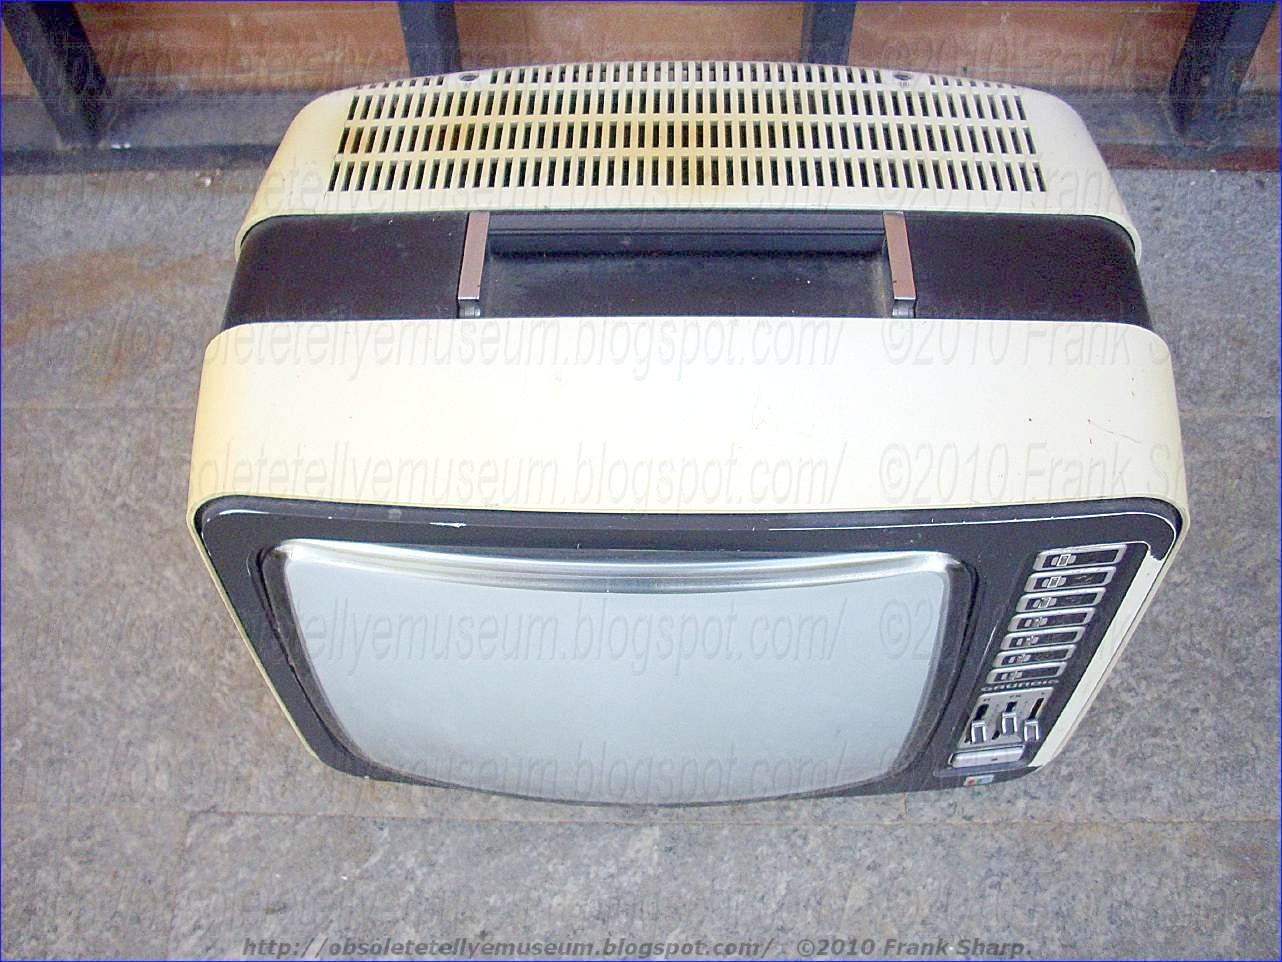 Obsolete Technology Tellye !: GRUNDIG SUPER COLOR 1510 YEAR 1973.